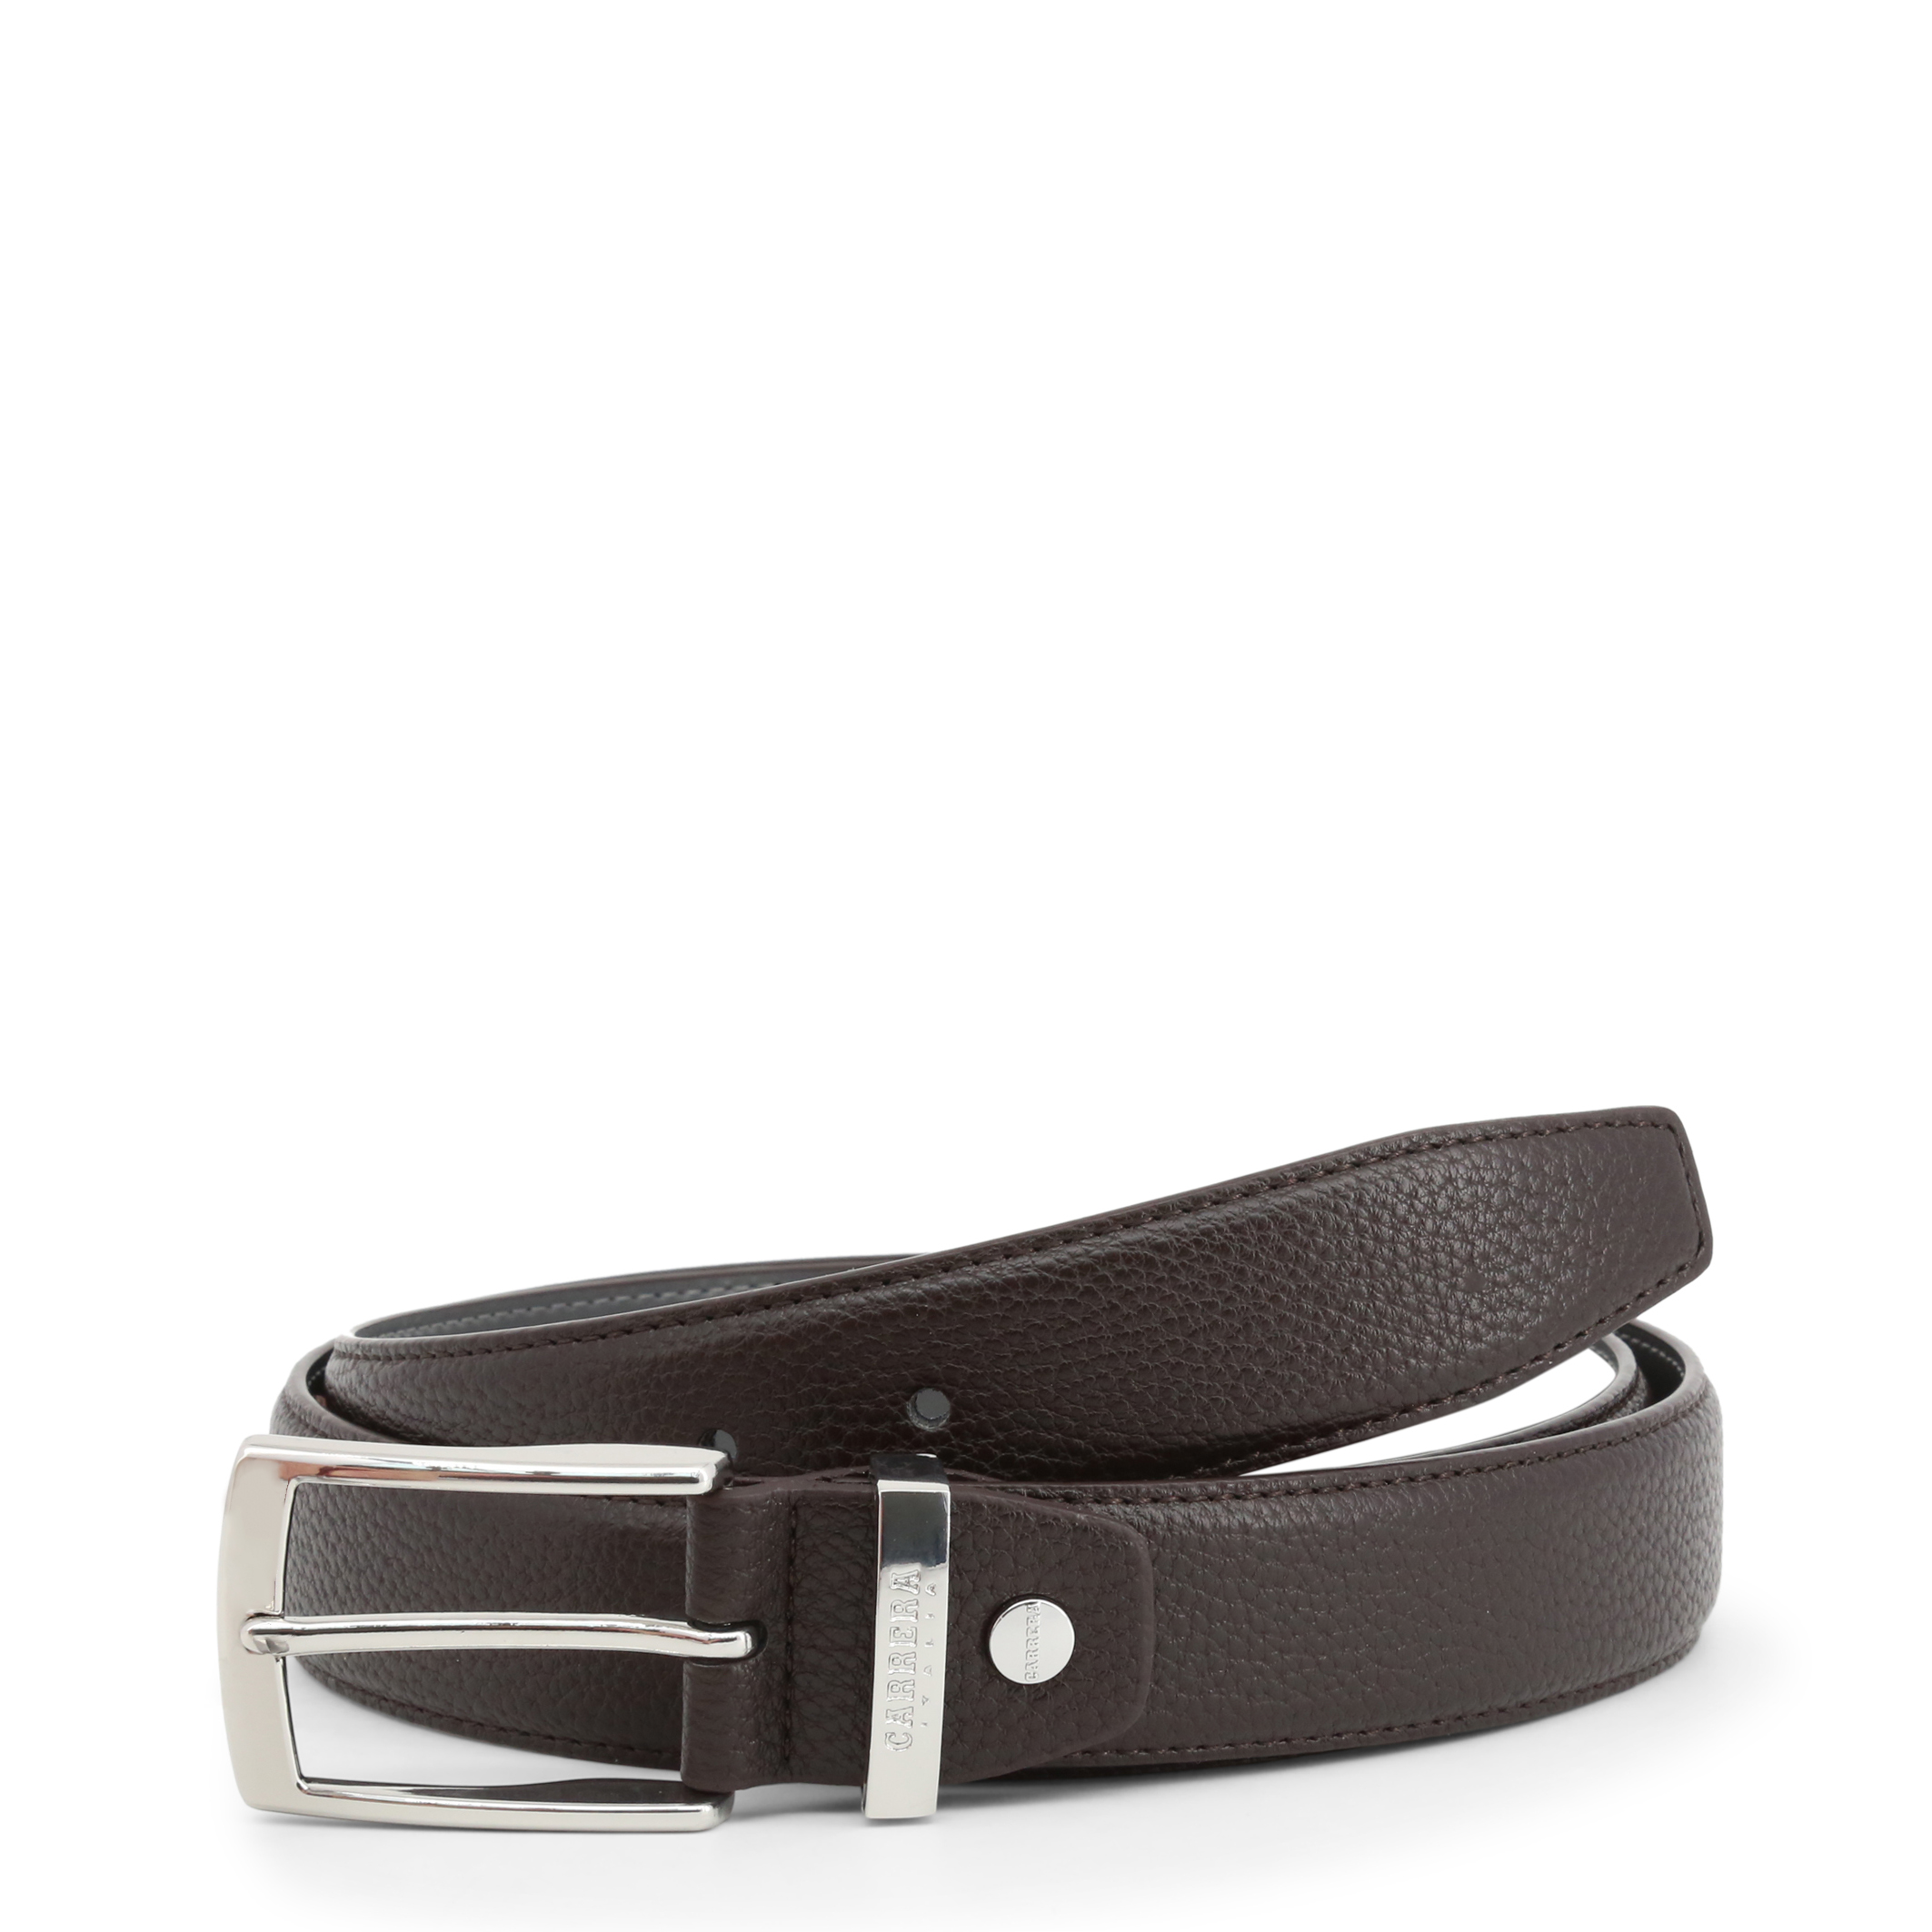 Carrera Jeans CB2701